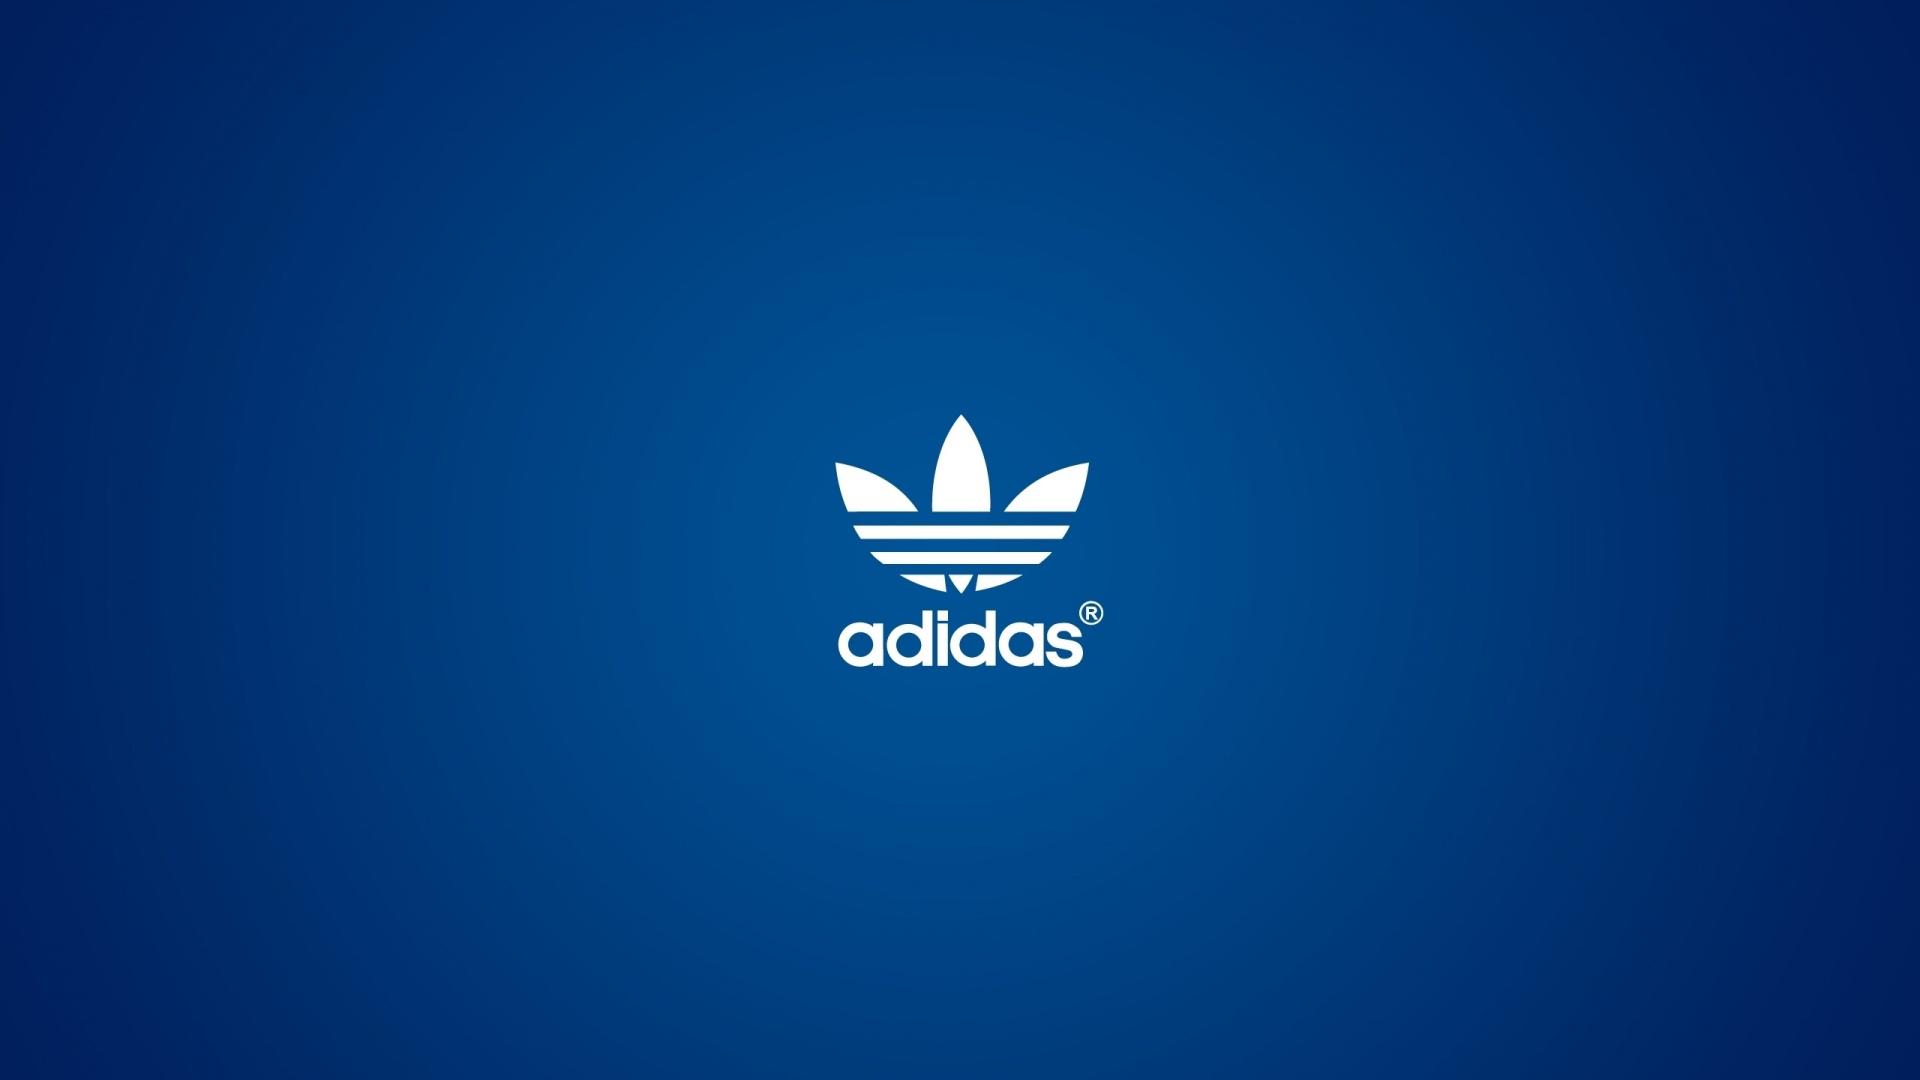 wallpaper logo adidas wallpapers 1920x1080 1920x1080